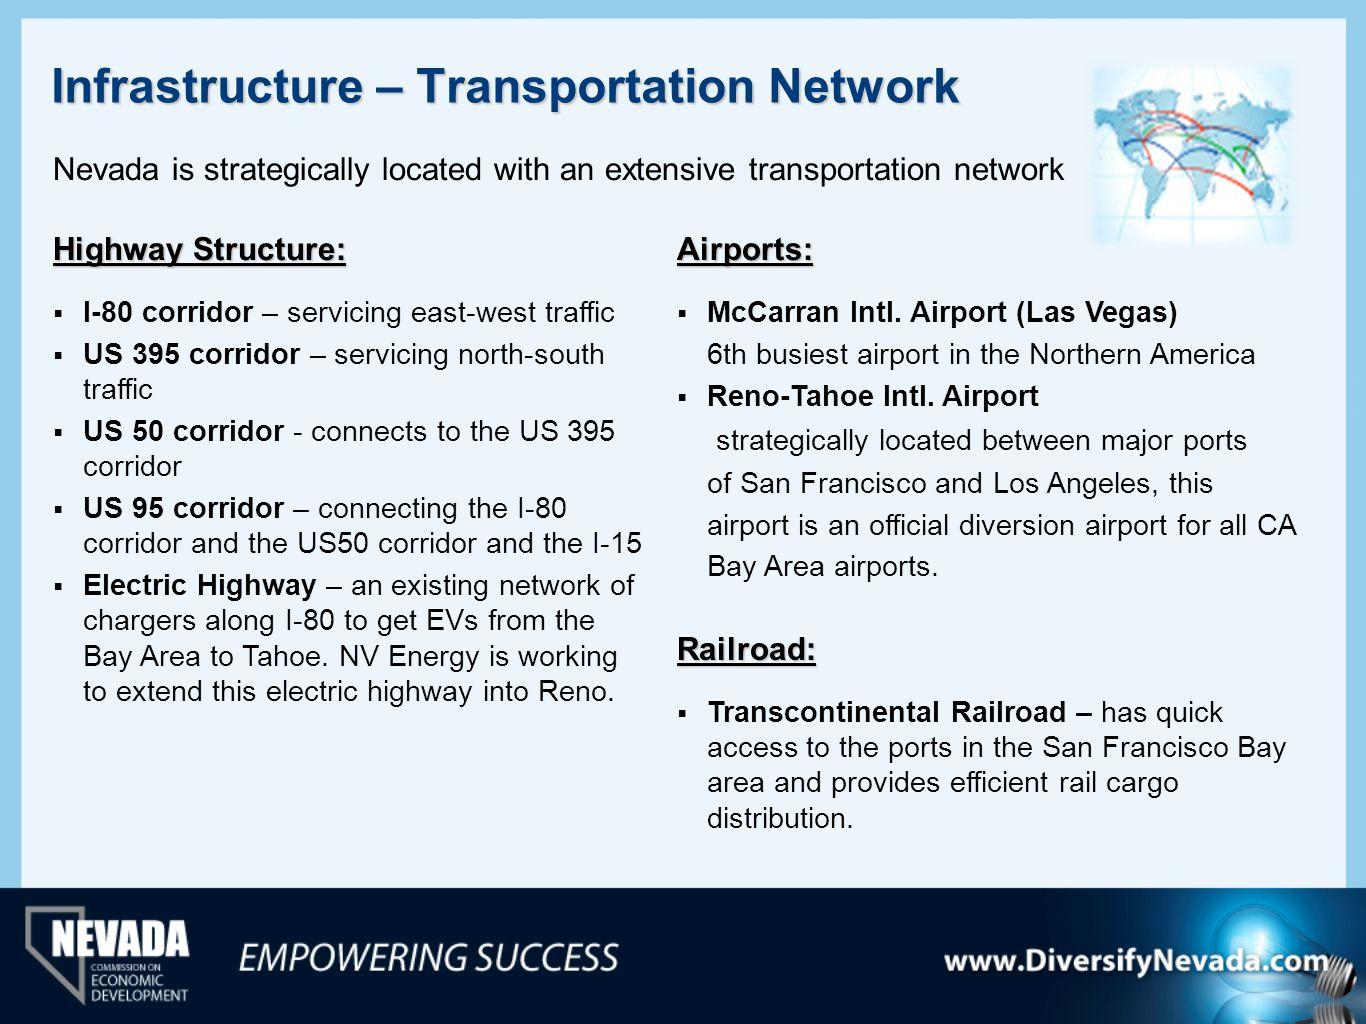 Infrastructure – Transportation Network Highway Structure: I-80 corridor – servicing east-west traffic US 395 corridor – servicing north-south traffic